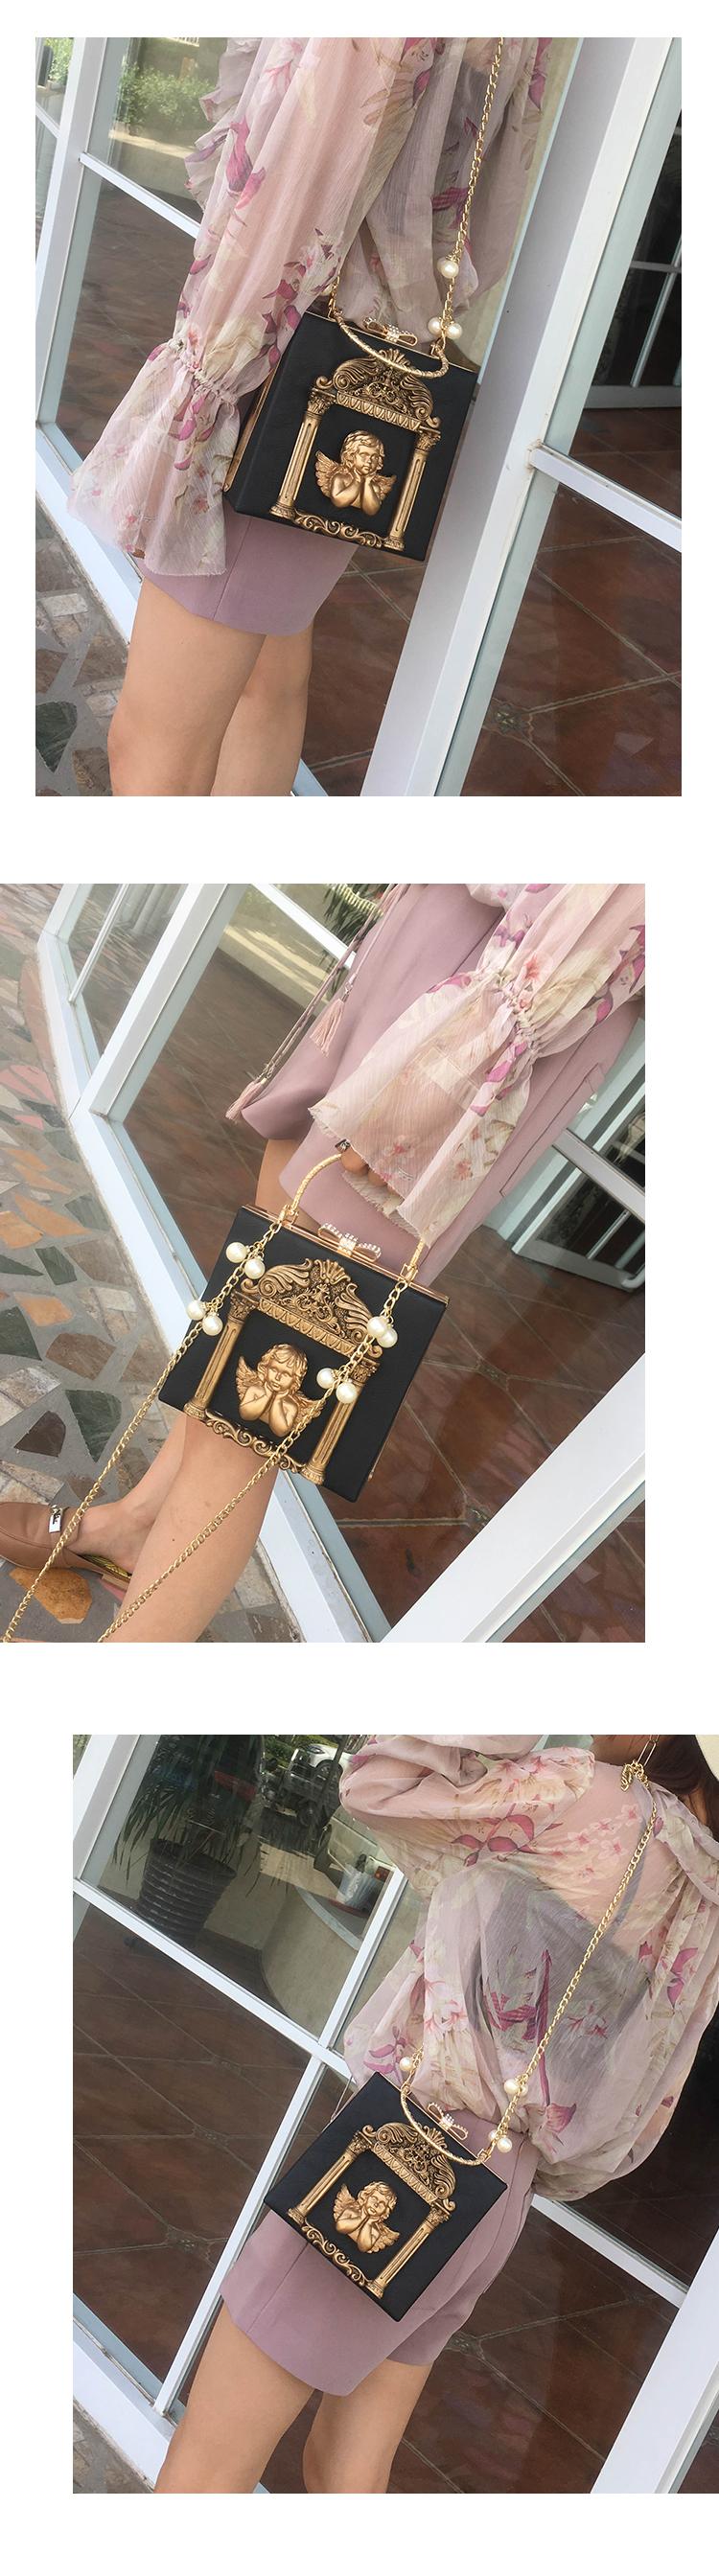 2018 NEW Rose 3D Palace Sculpture Frame Bag Luxury Handbags Women Party Bags Designer Lady Cute Shoulder Messenger Bag Sac Tote 27